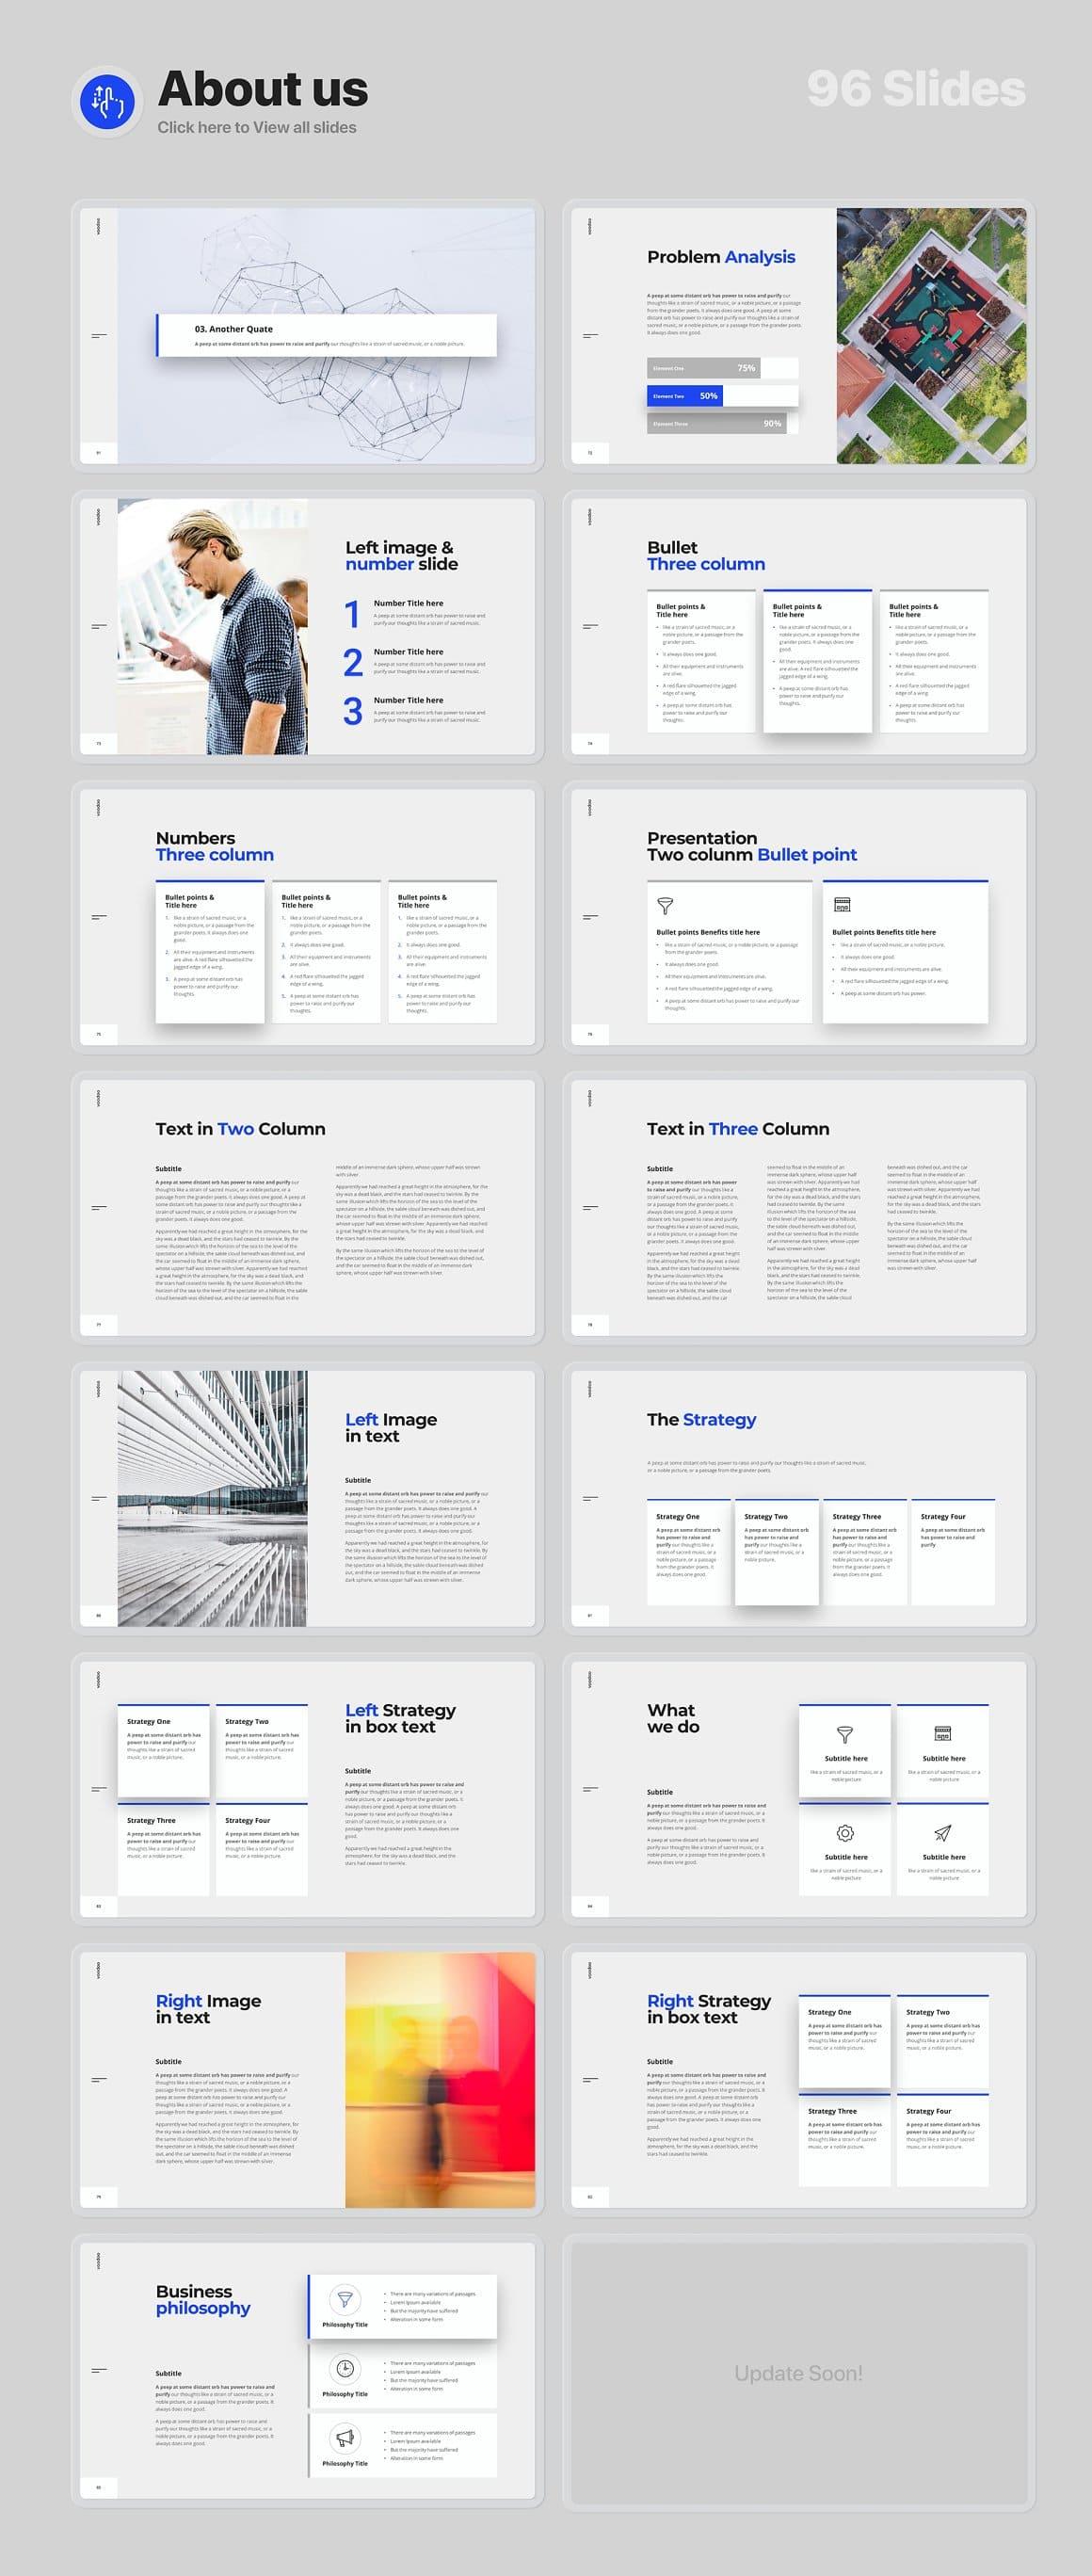 96 Slides About us part 3 Voodoo Presentation 4.0.